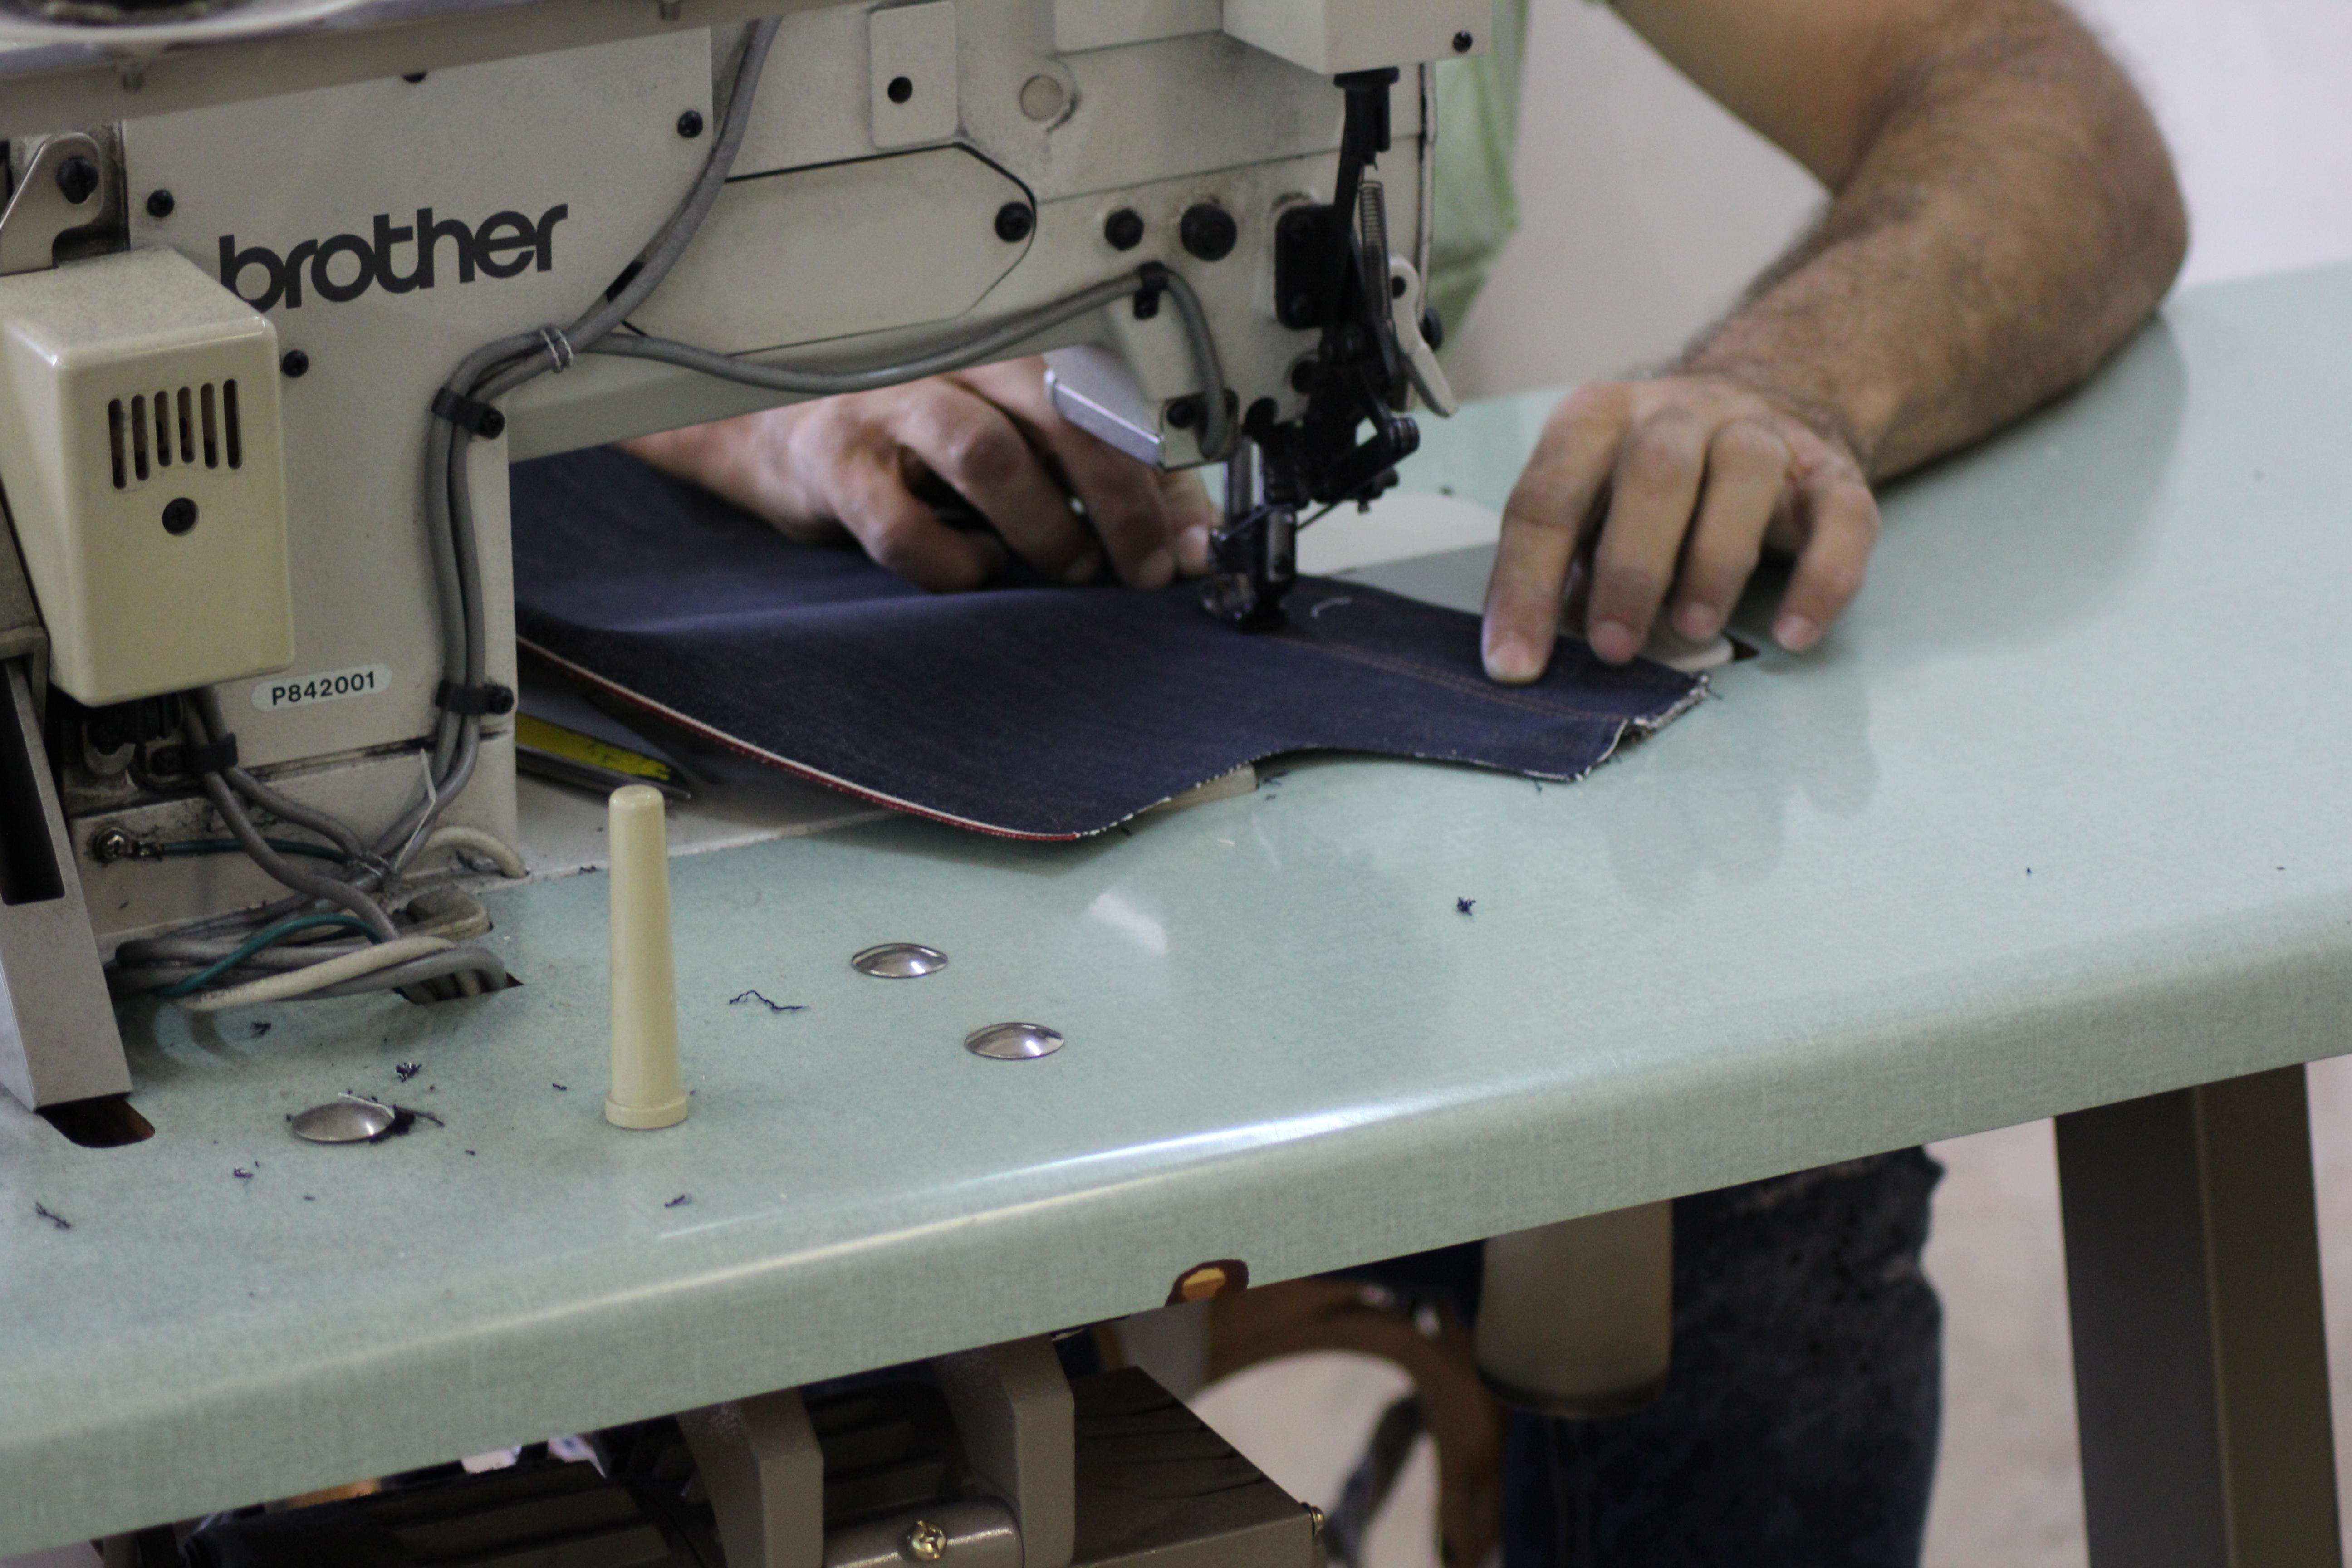 Ateliers de Nîmes fabrication artisans craftsmanship